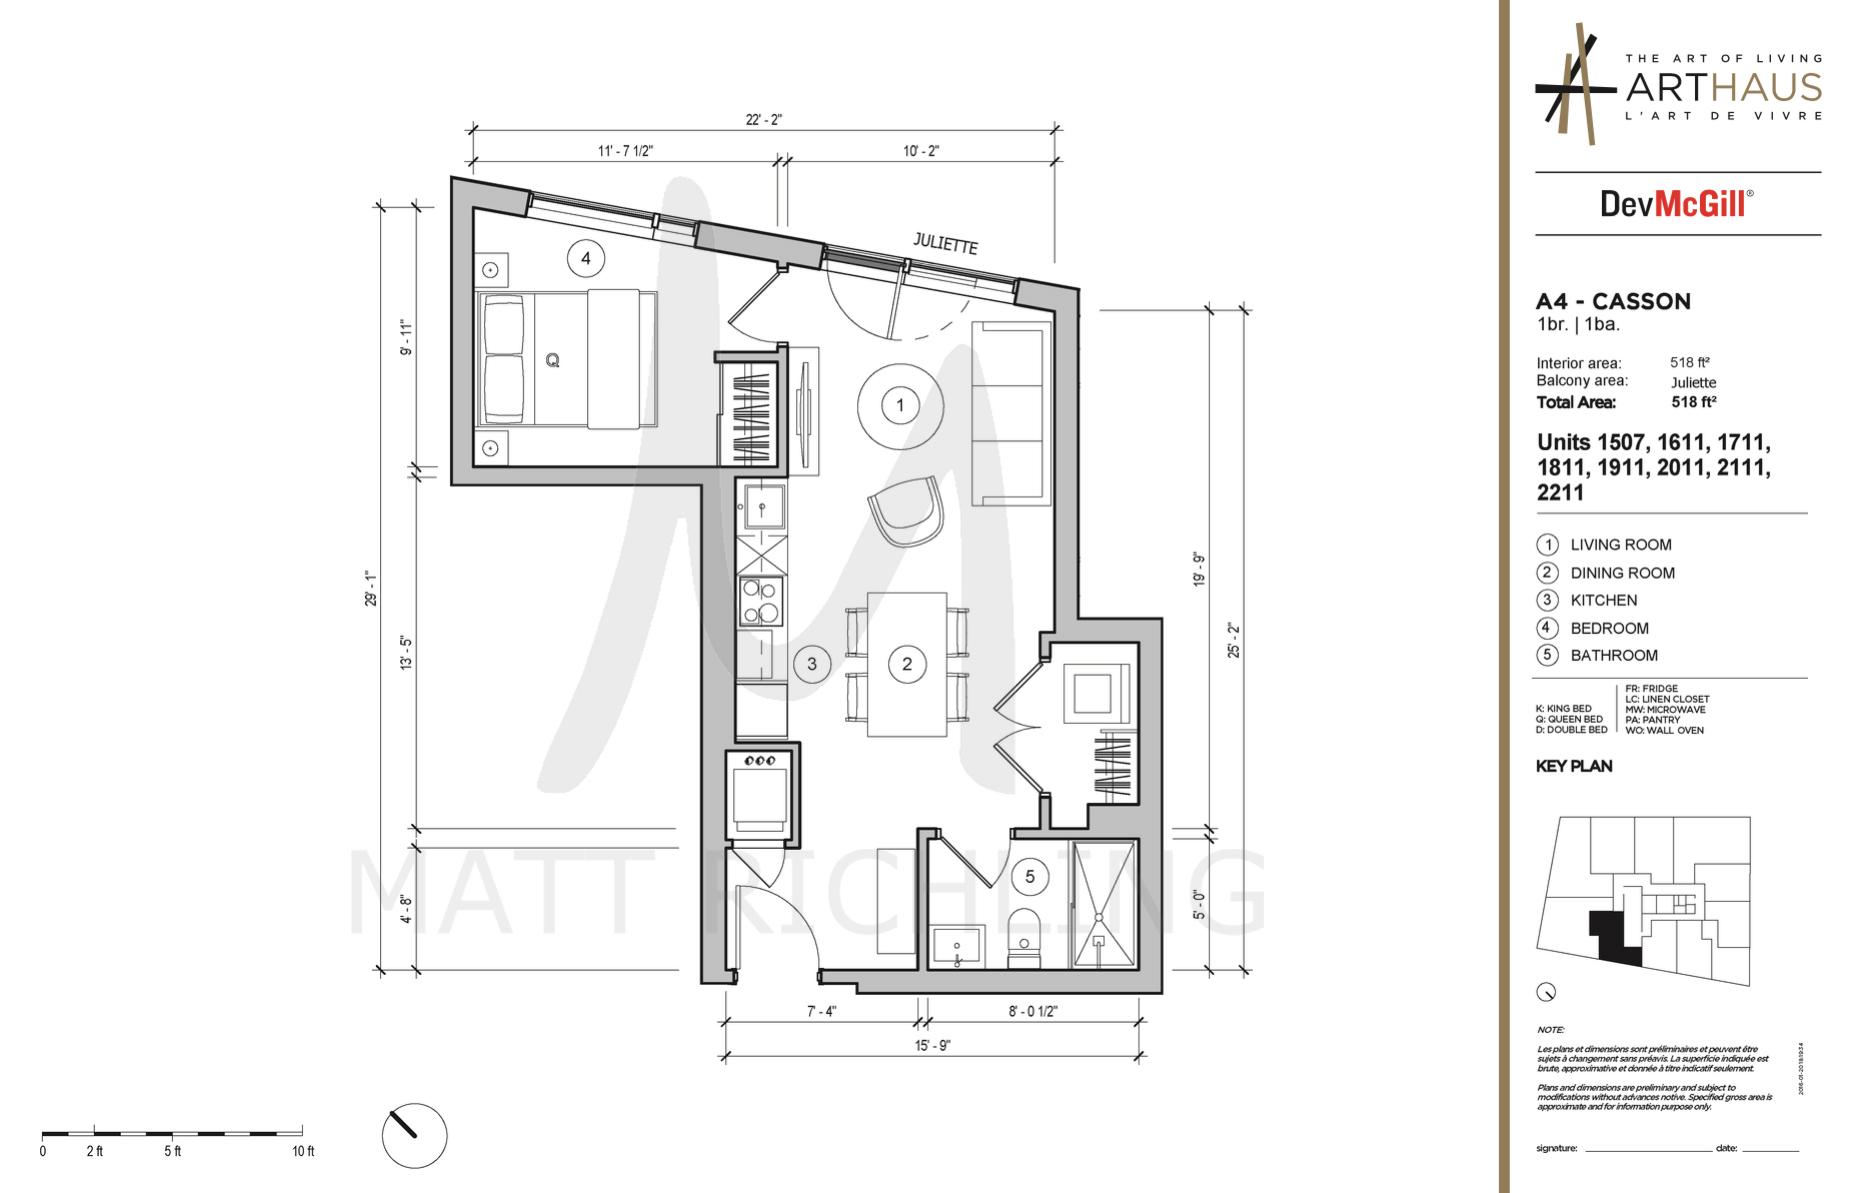 Arthaus---Casson-Floorplan.jpg